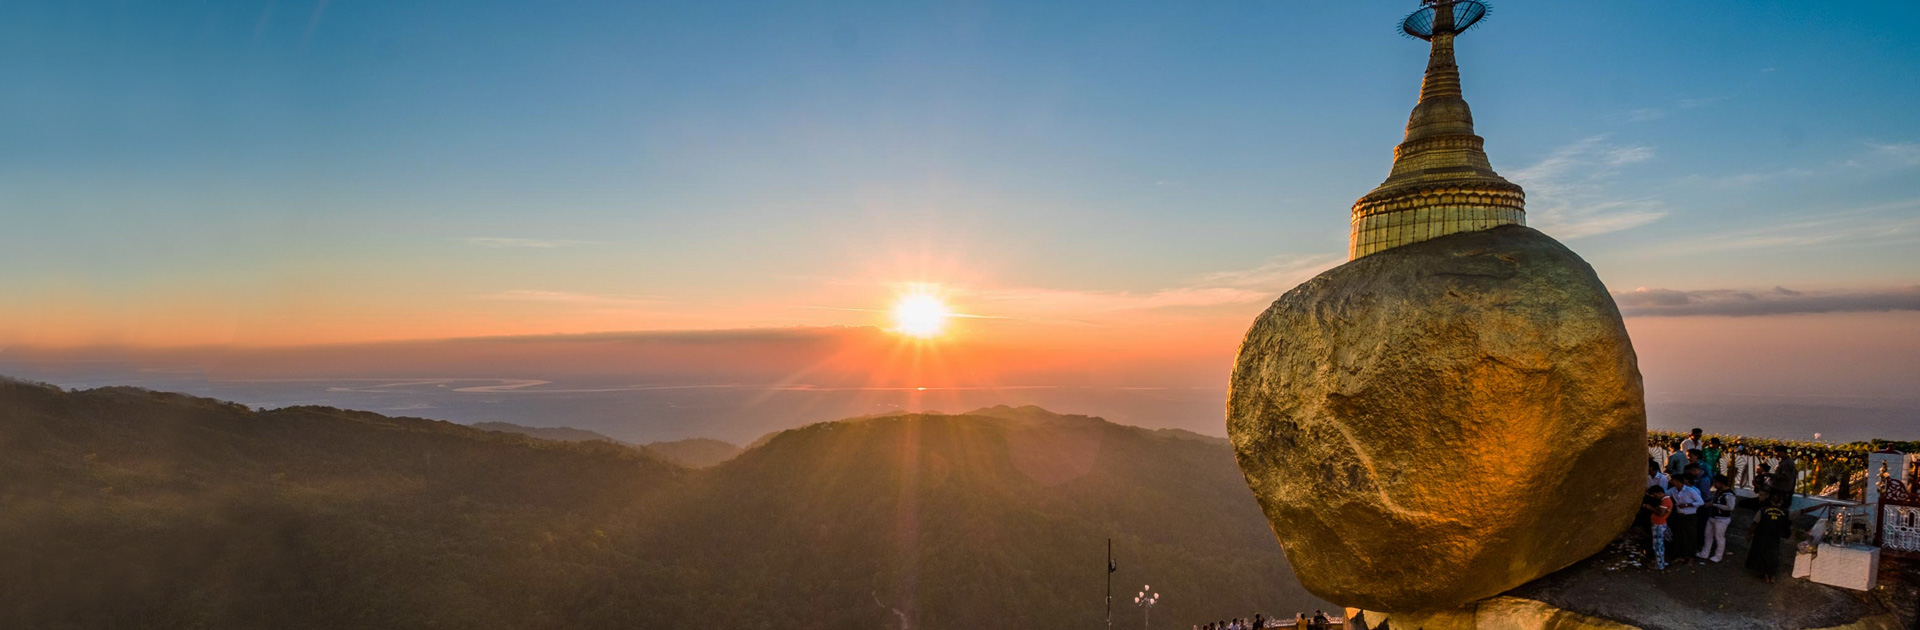 MM Myanmar Tierra Sagrada 17 días 1 2